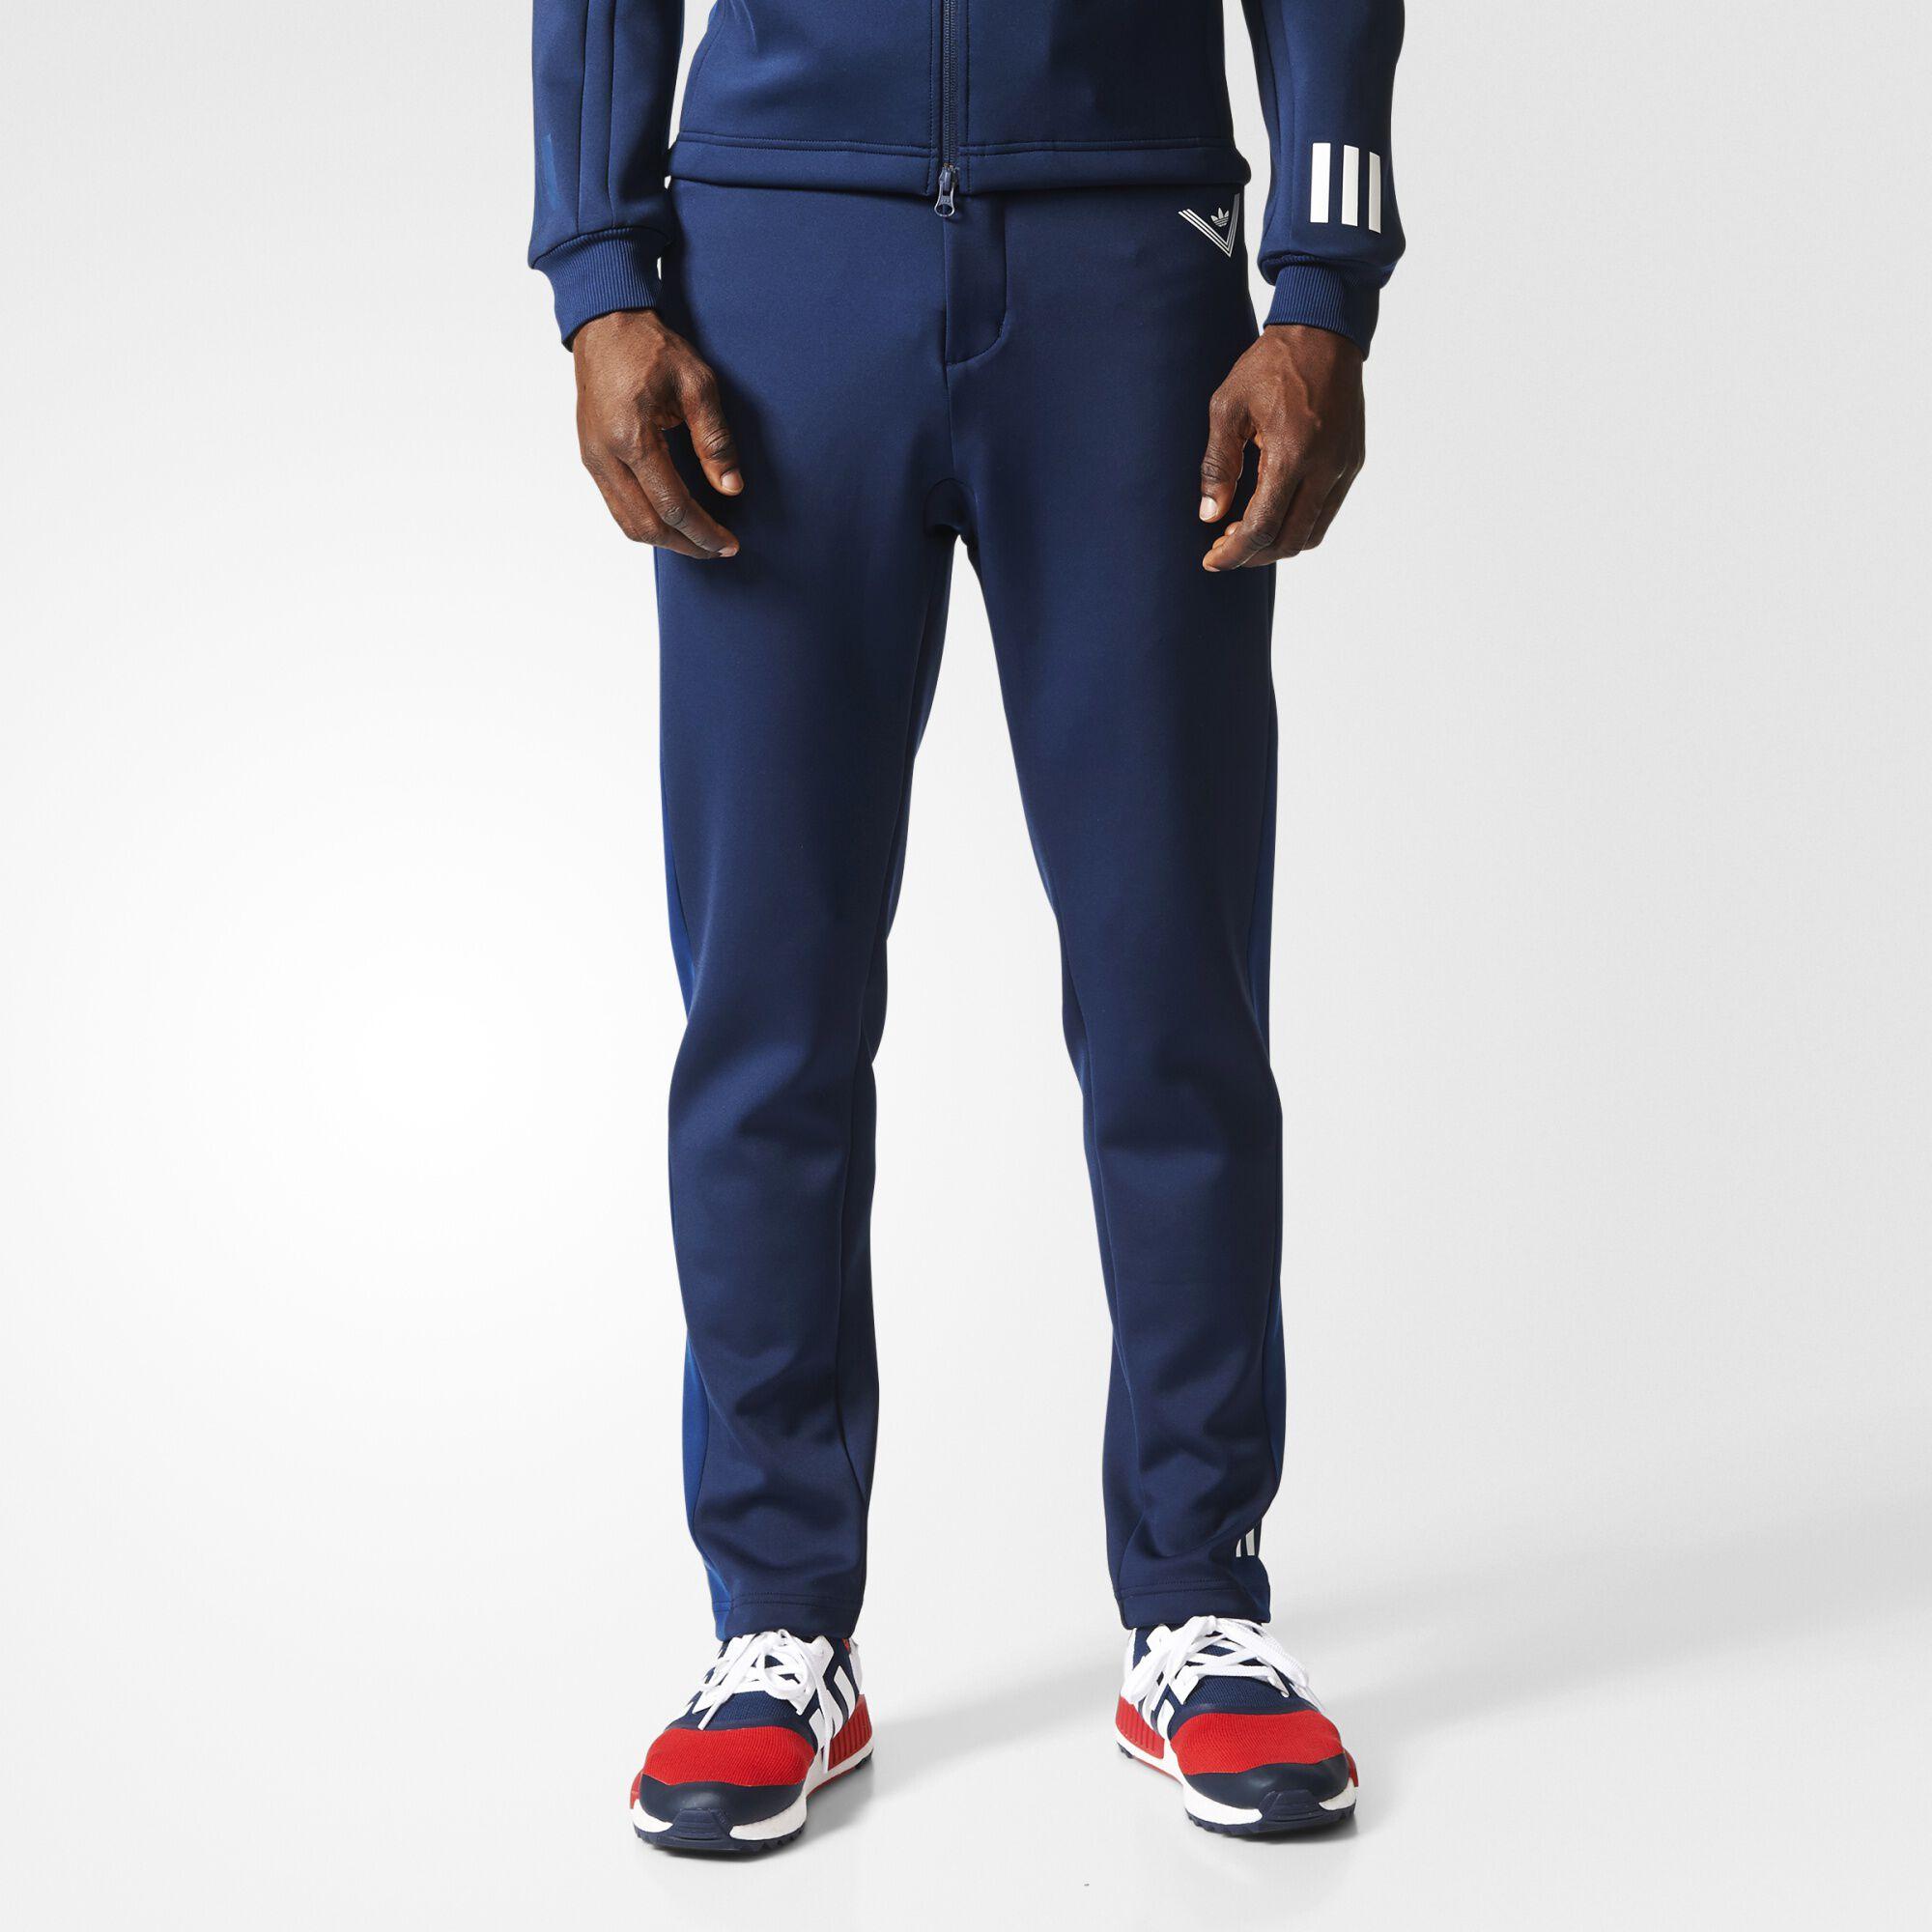 adidas slim fit track pants mens